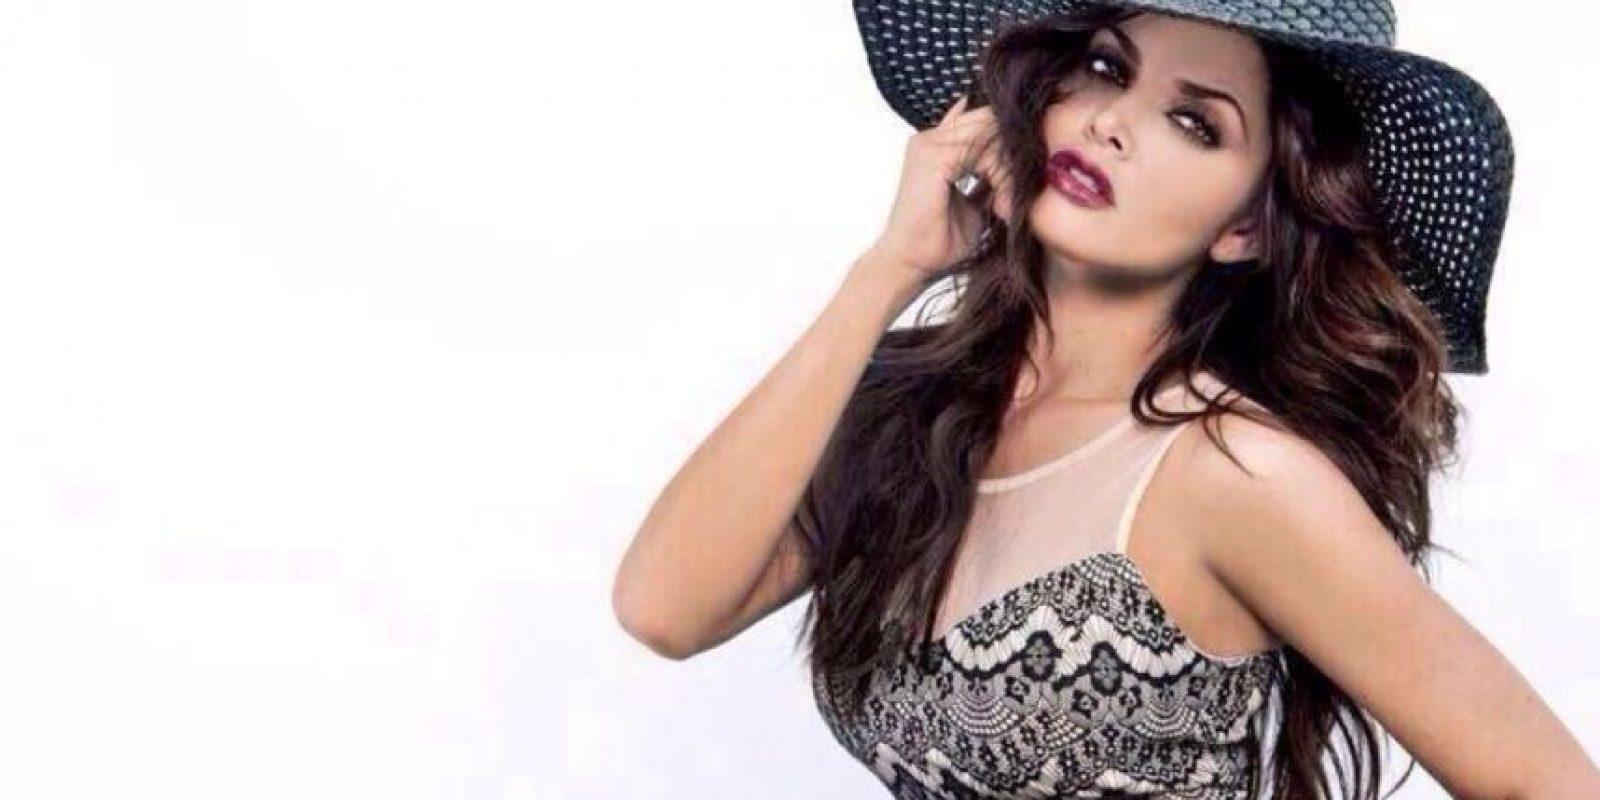 La bella conductora es esposa del mexicano Rafael Márquez Lugo Foto:Twitter: @marisolglzz